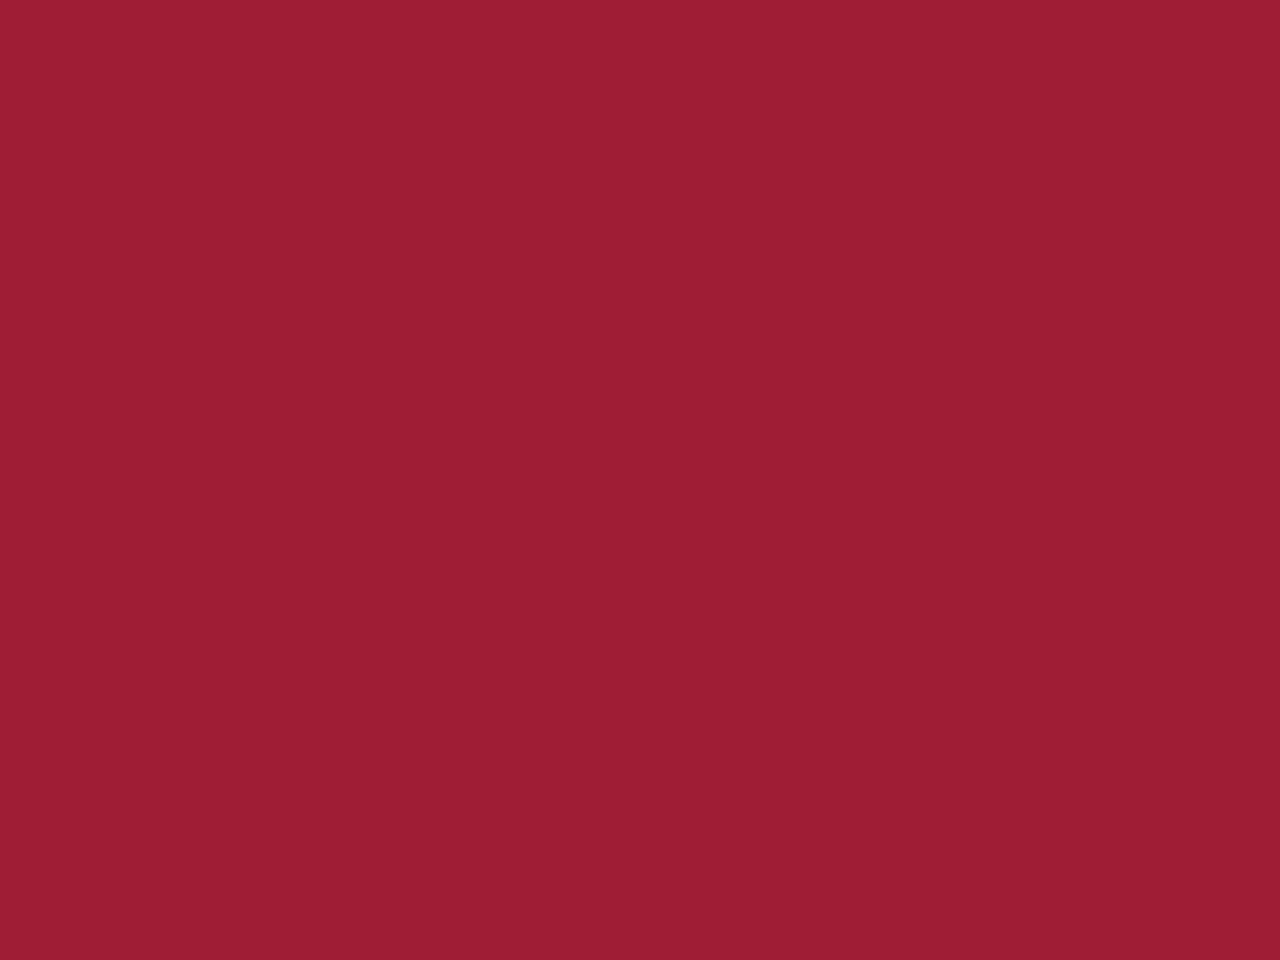 1280x960 Vivid Burgundy Solid Color Background